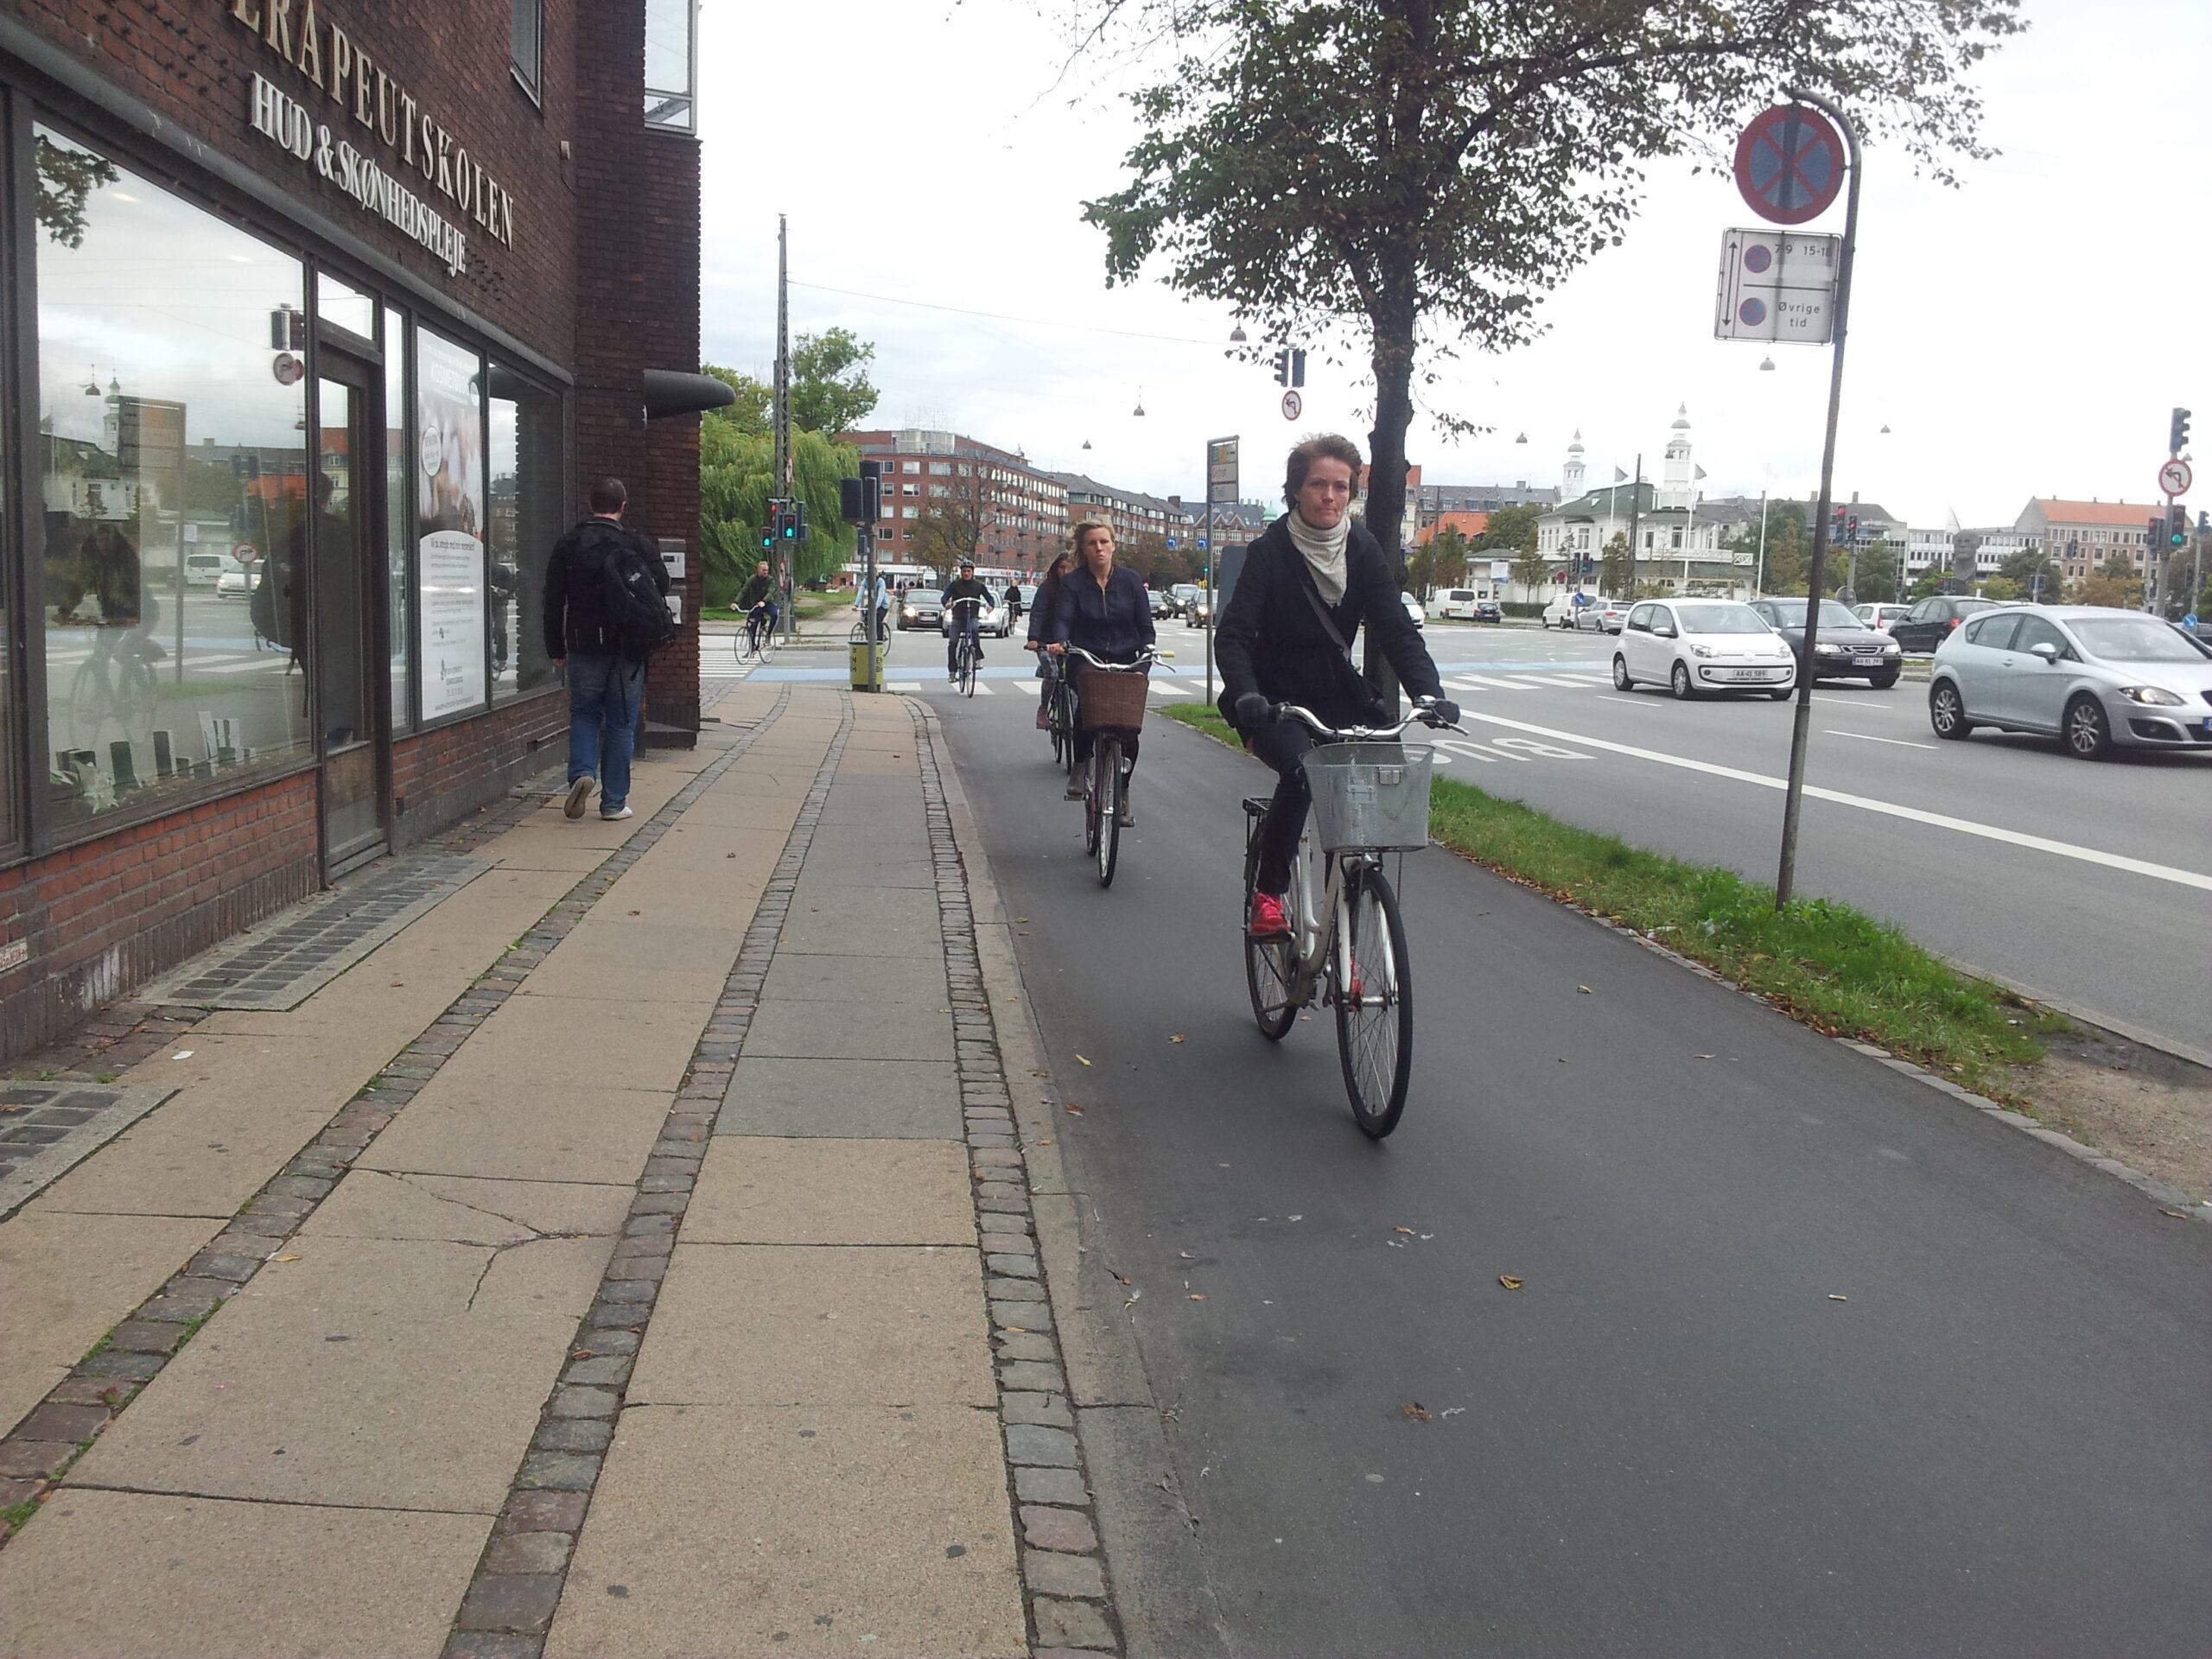 Köpenhamn alltså.